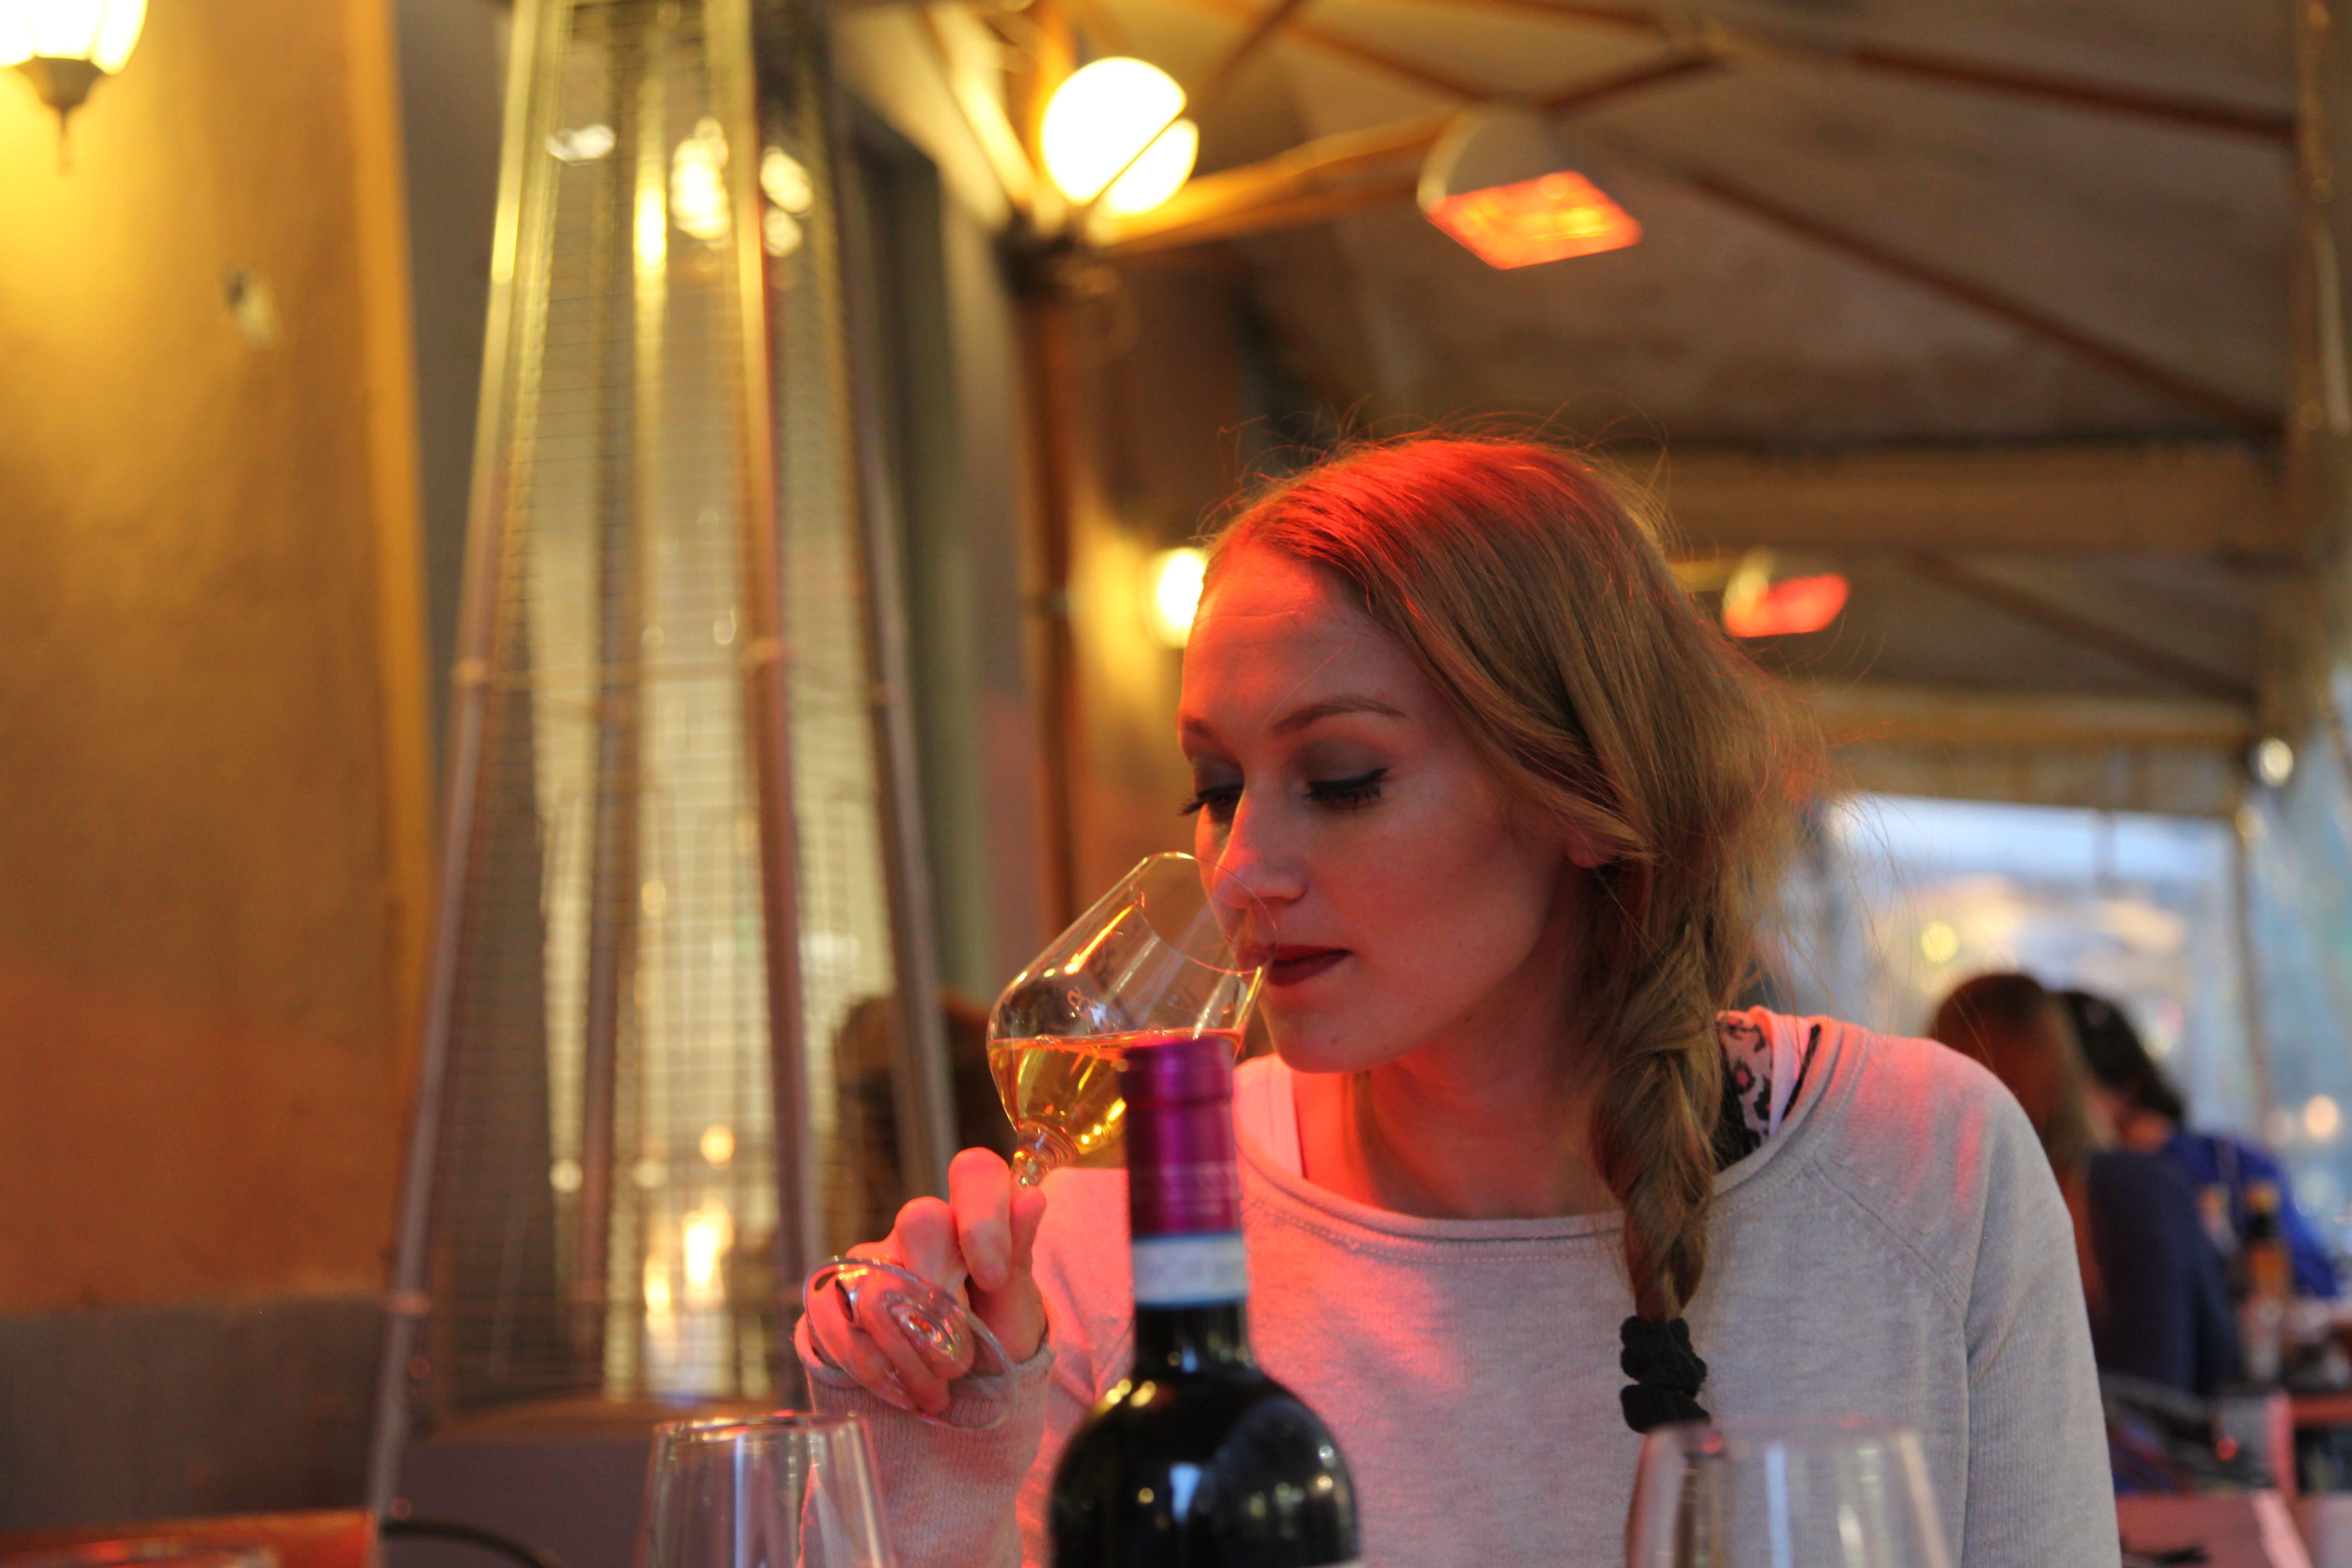 This wine is mine!